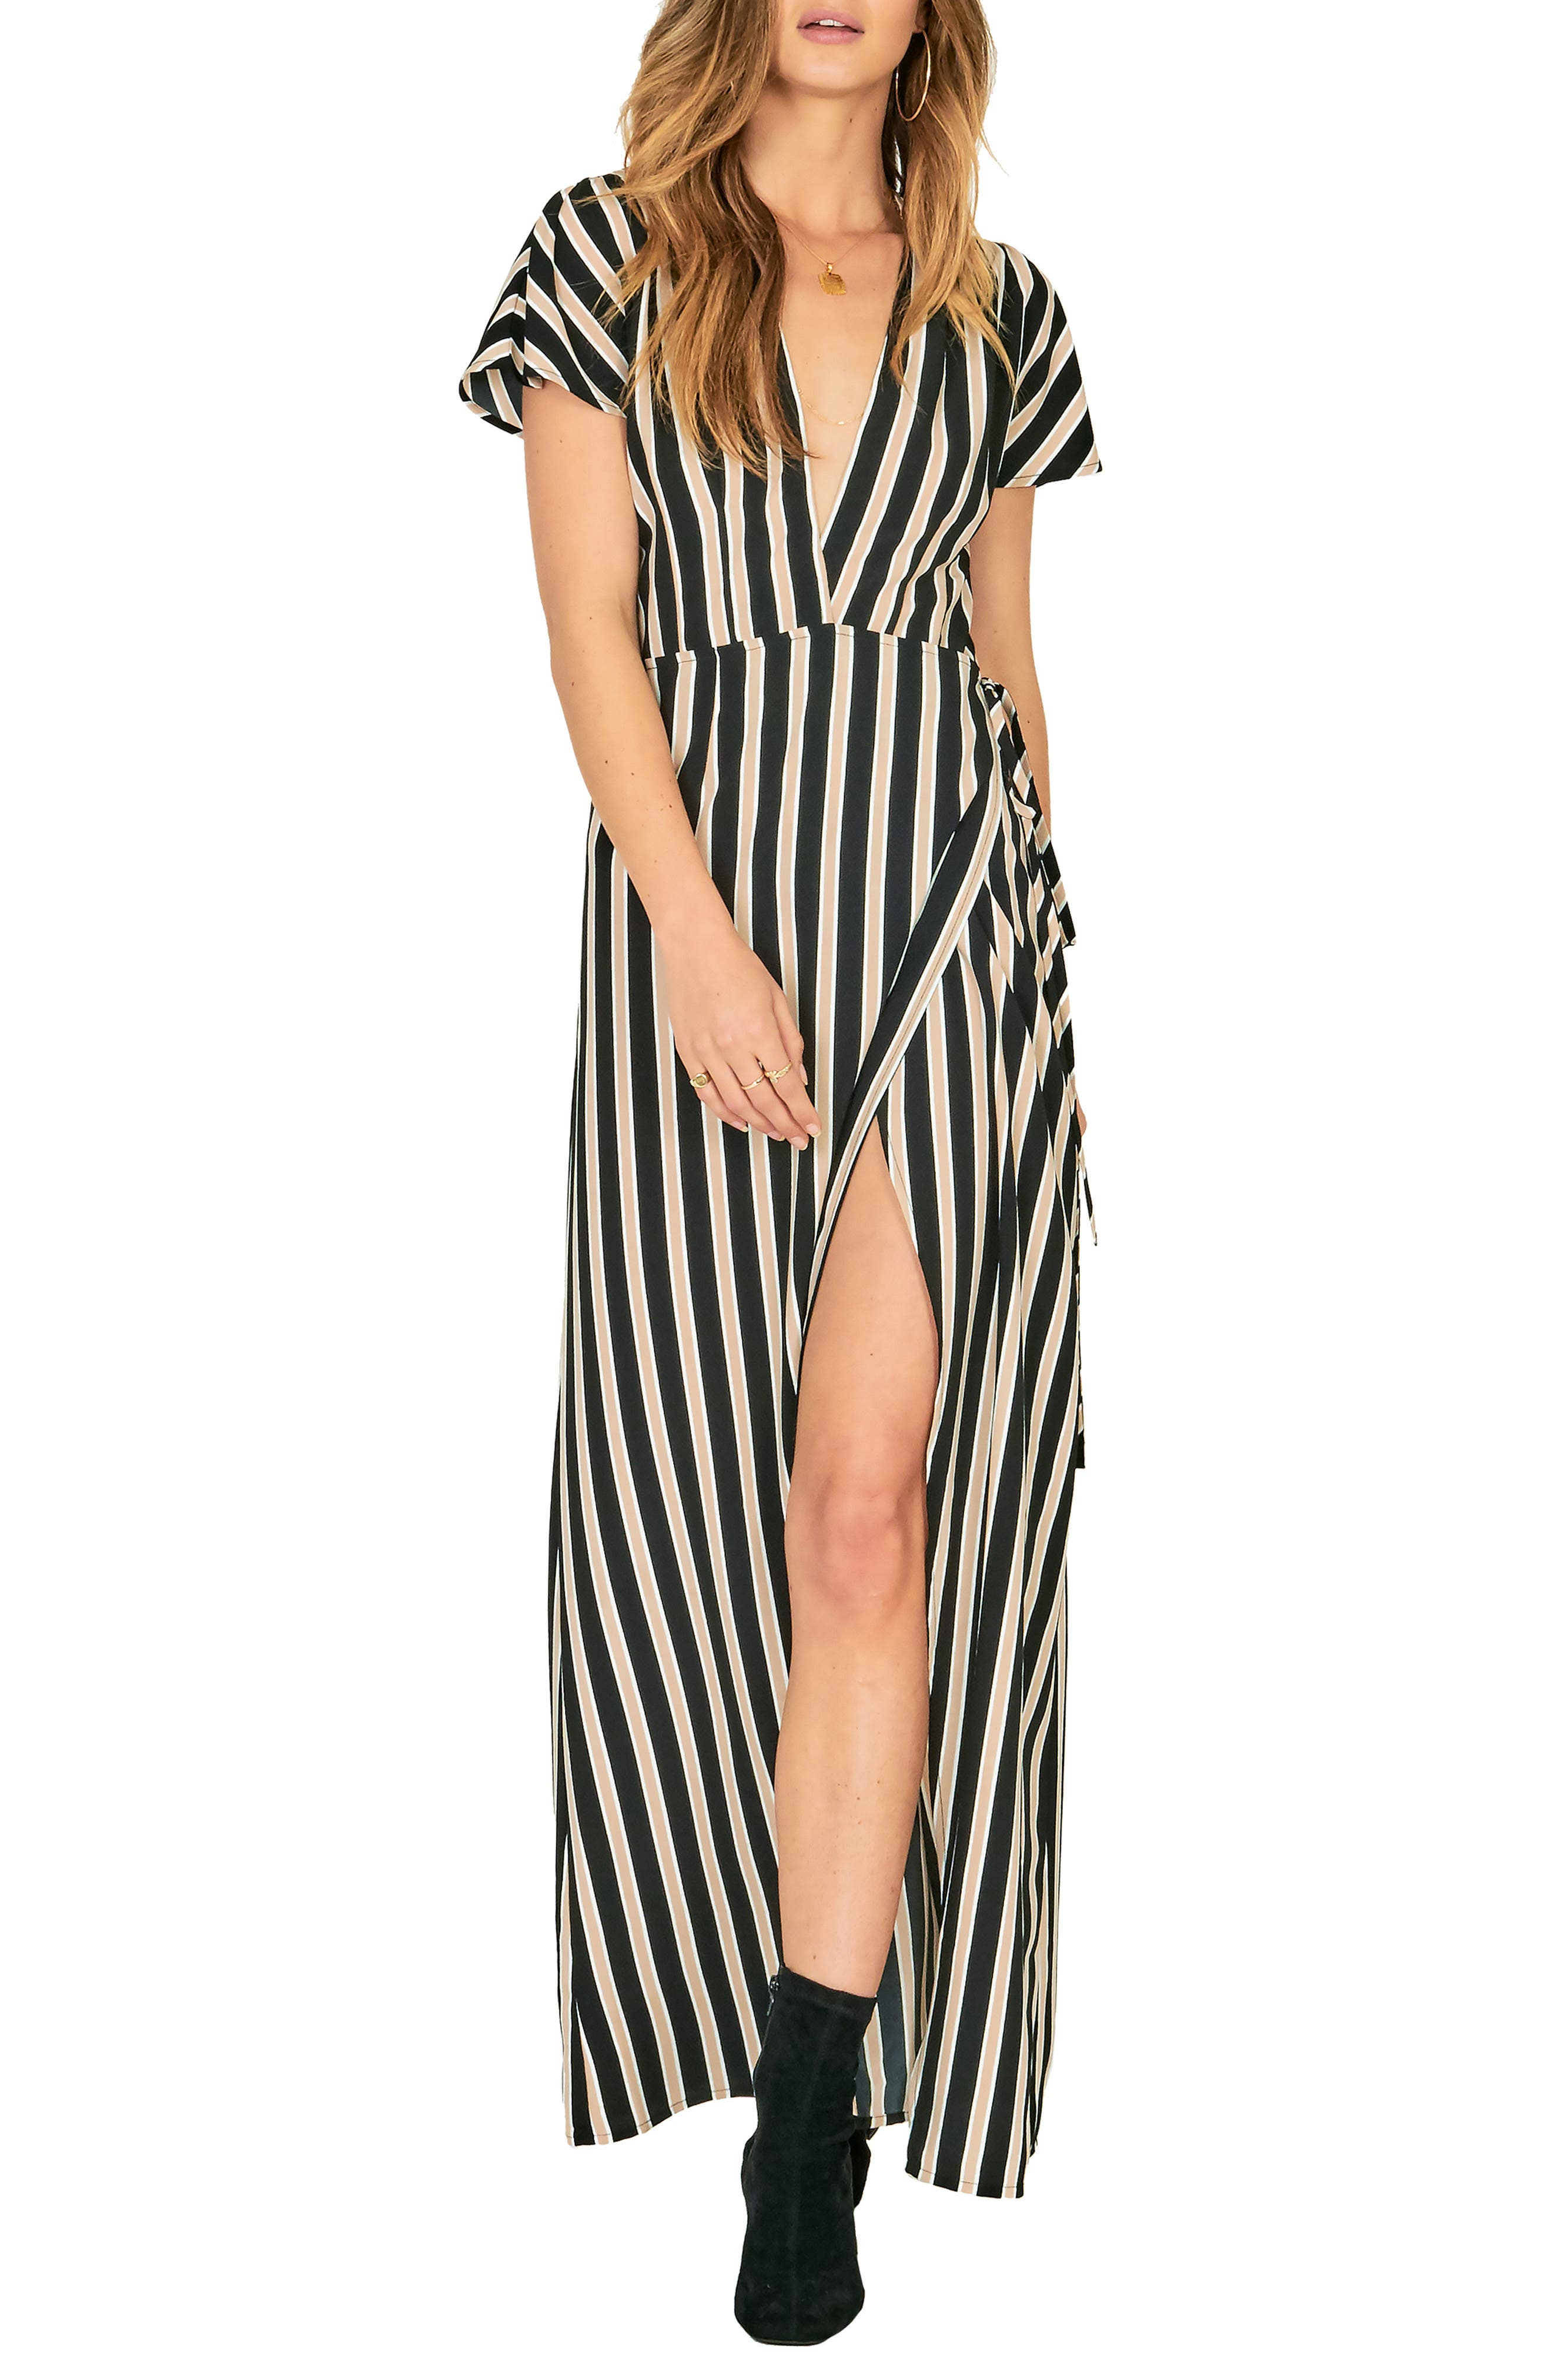 Amuse Society Fit To Be Tied Maxi Dress, Black